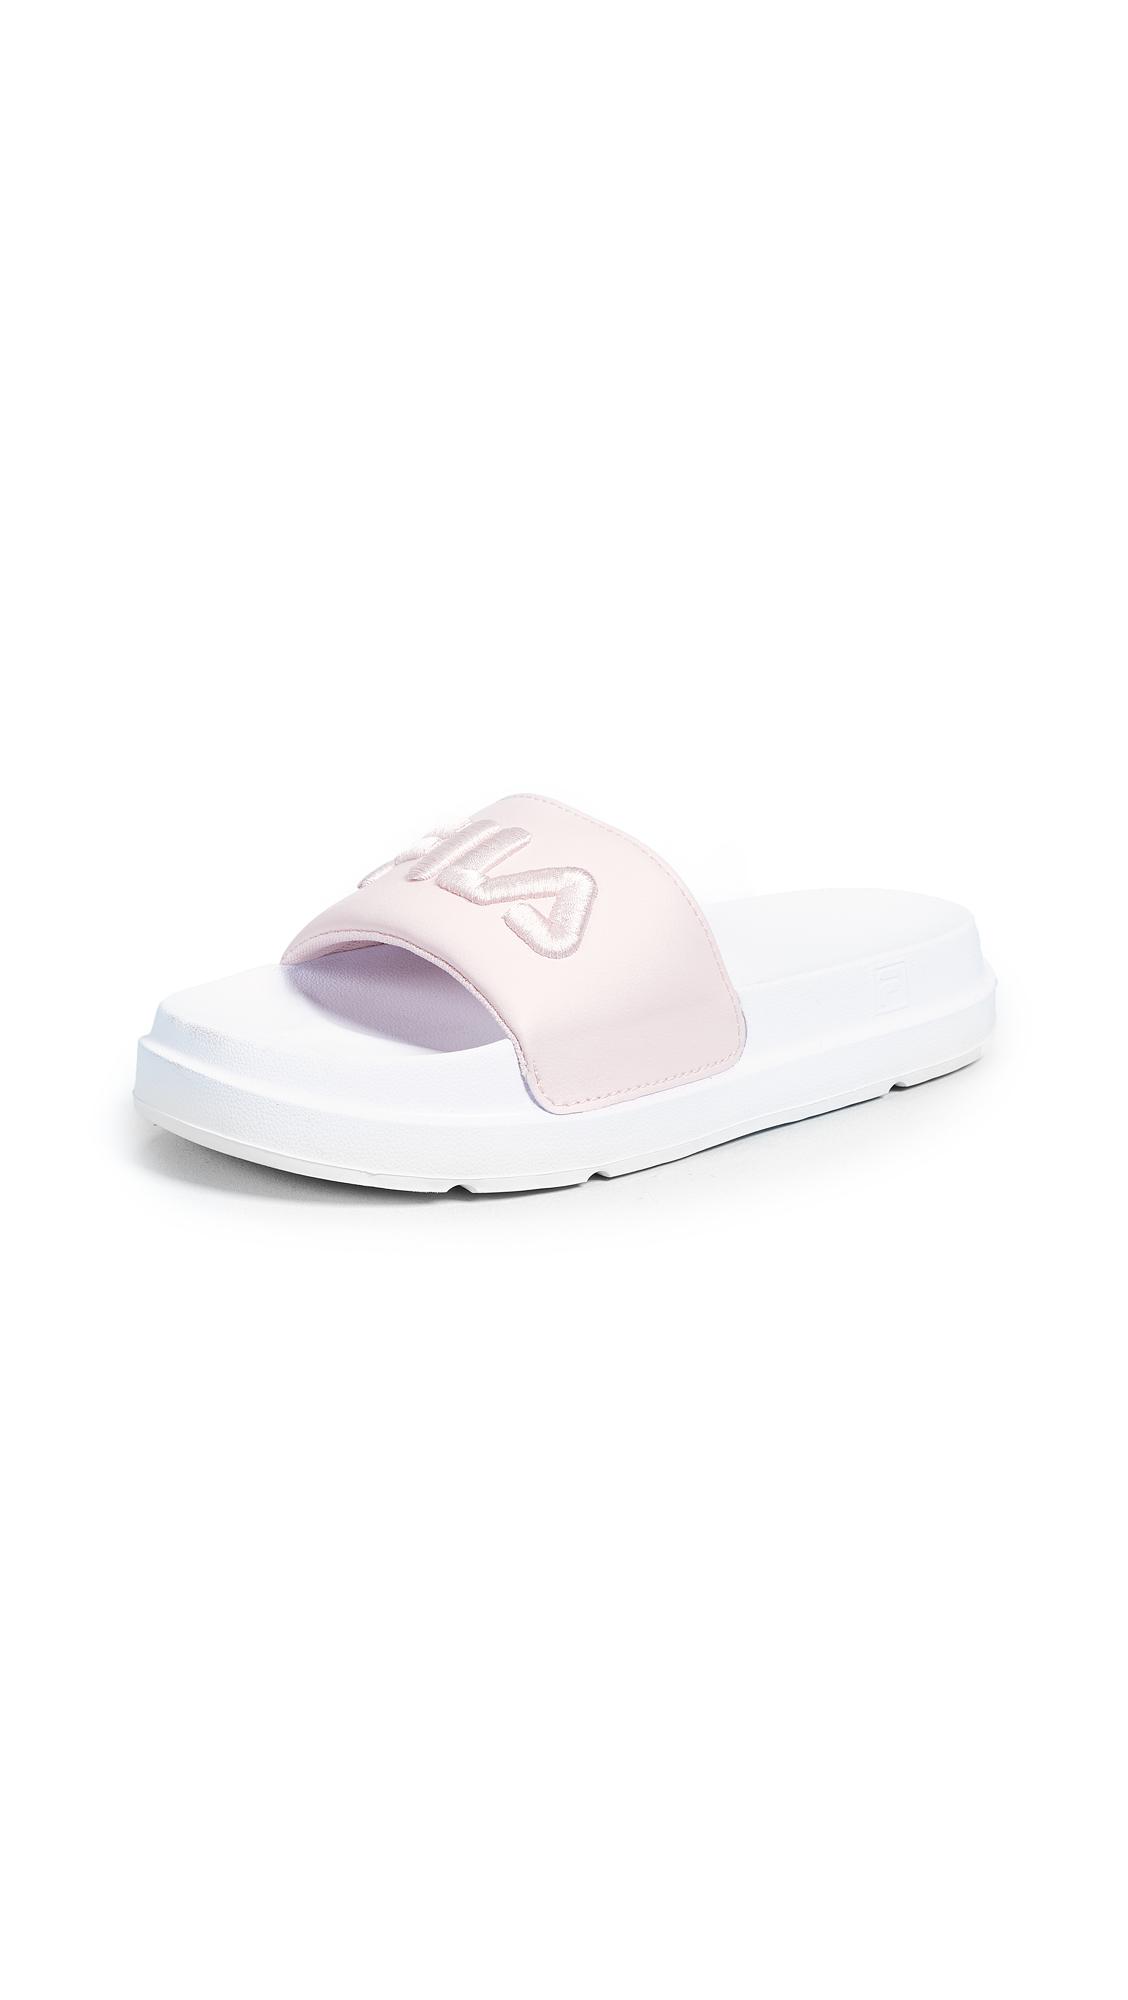 Fila Drifter Bold Slides - Chalk Pink/White